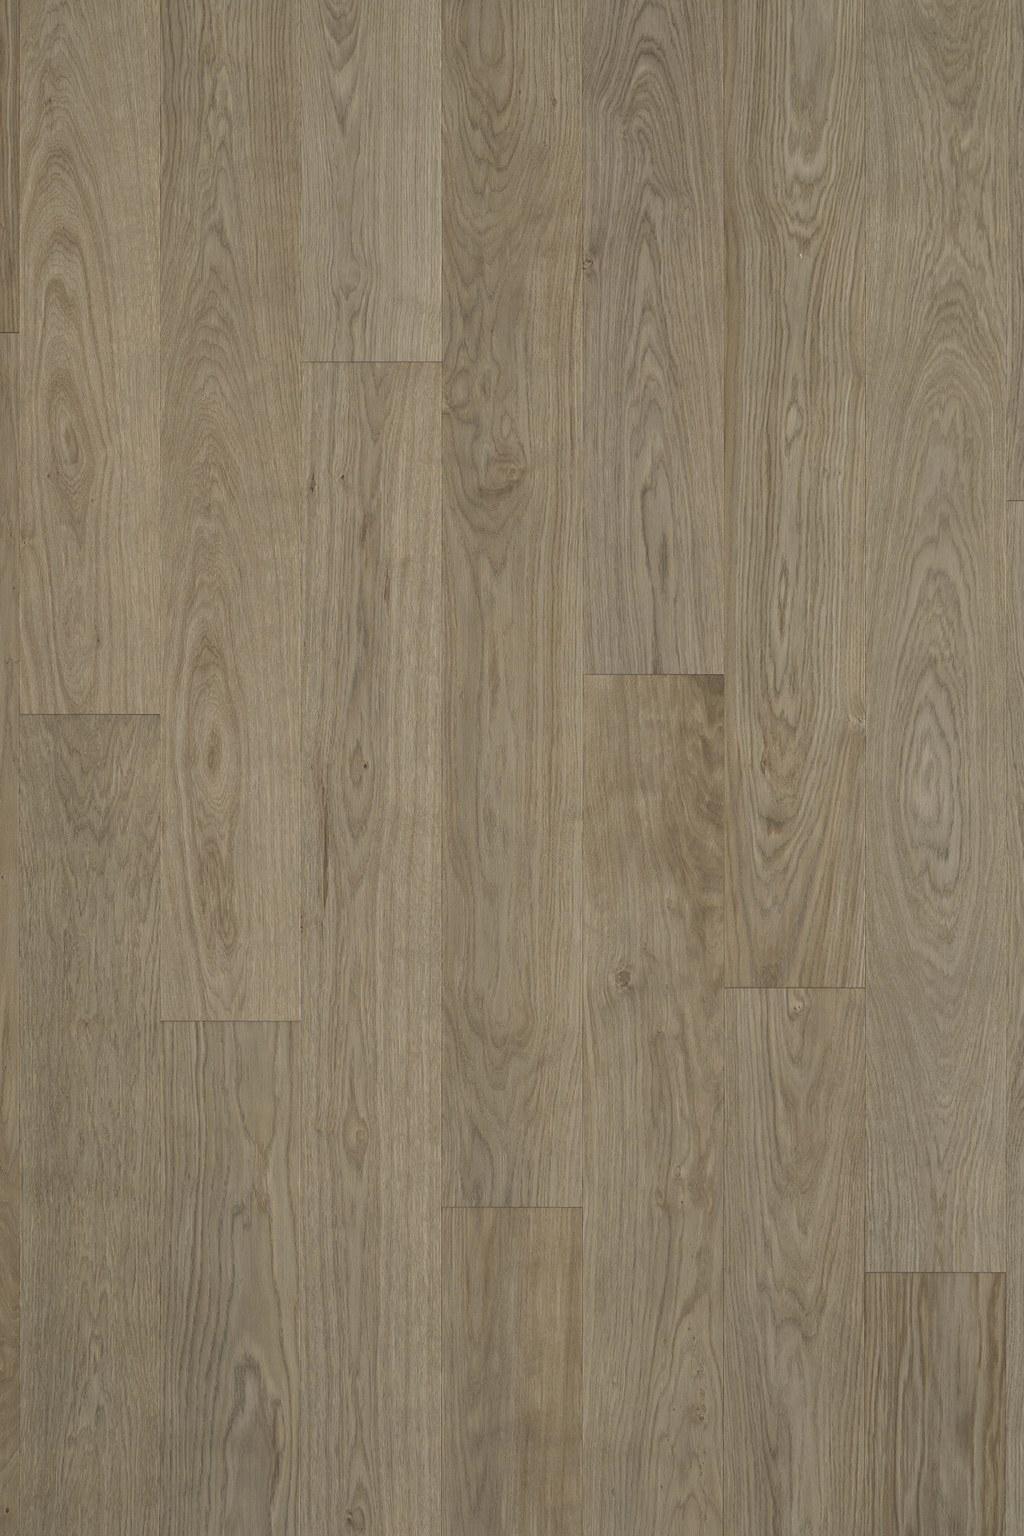 Timberwise parketti lankkuparketti puulattia wooden floor parquet plank Tammi Oak Classic Amore Brown_2D1